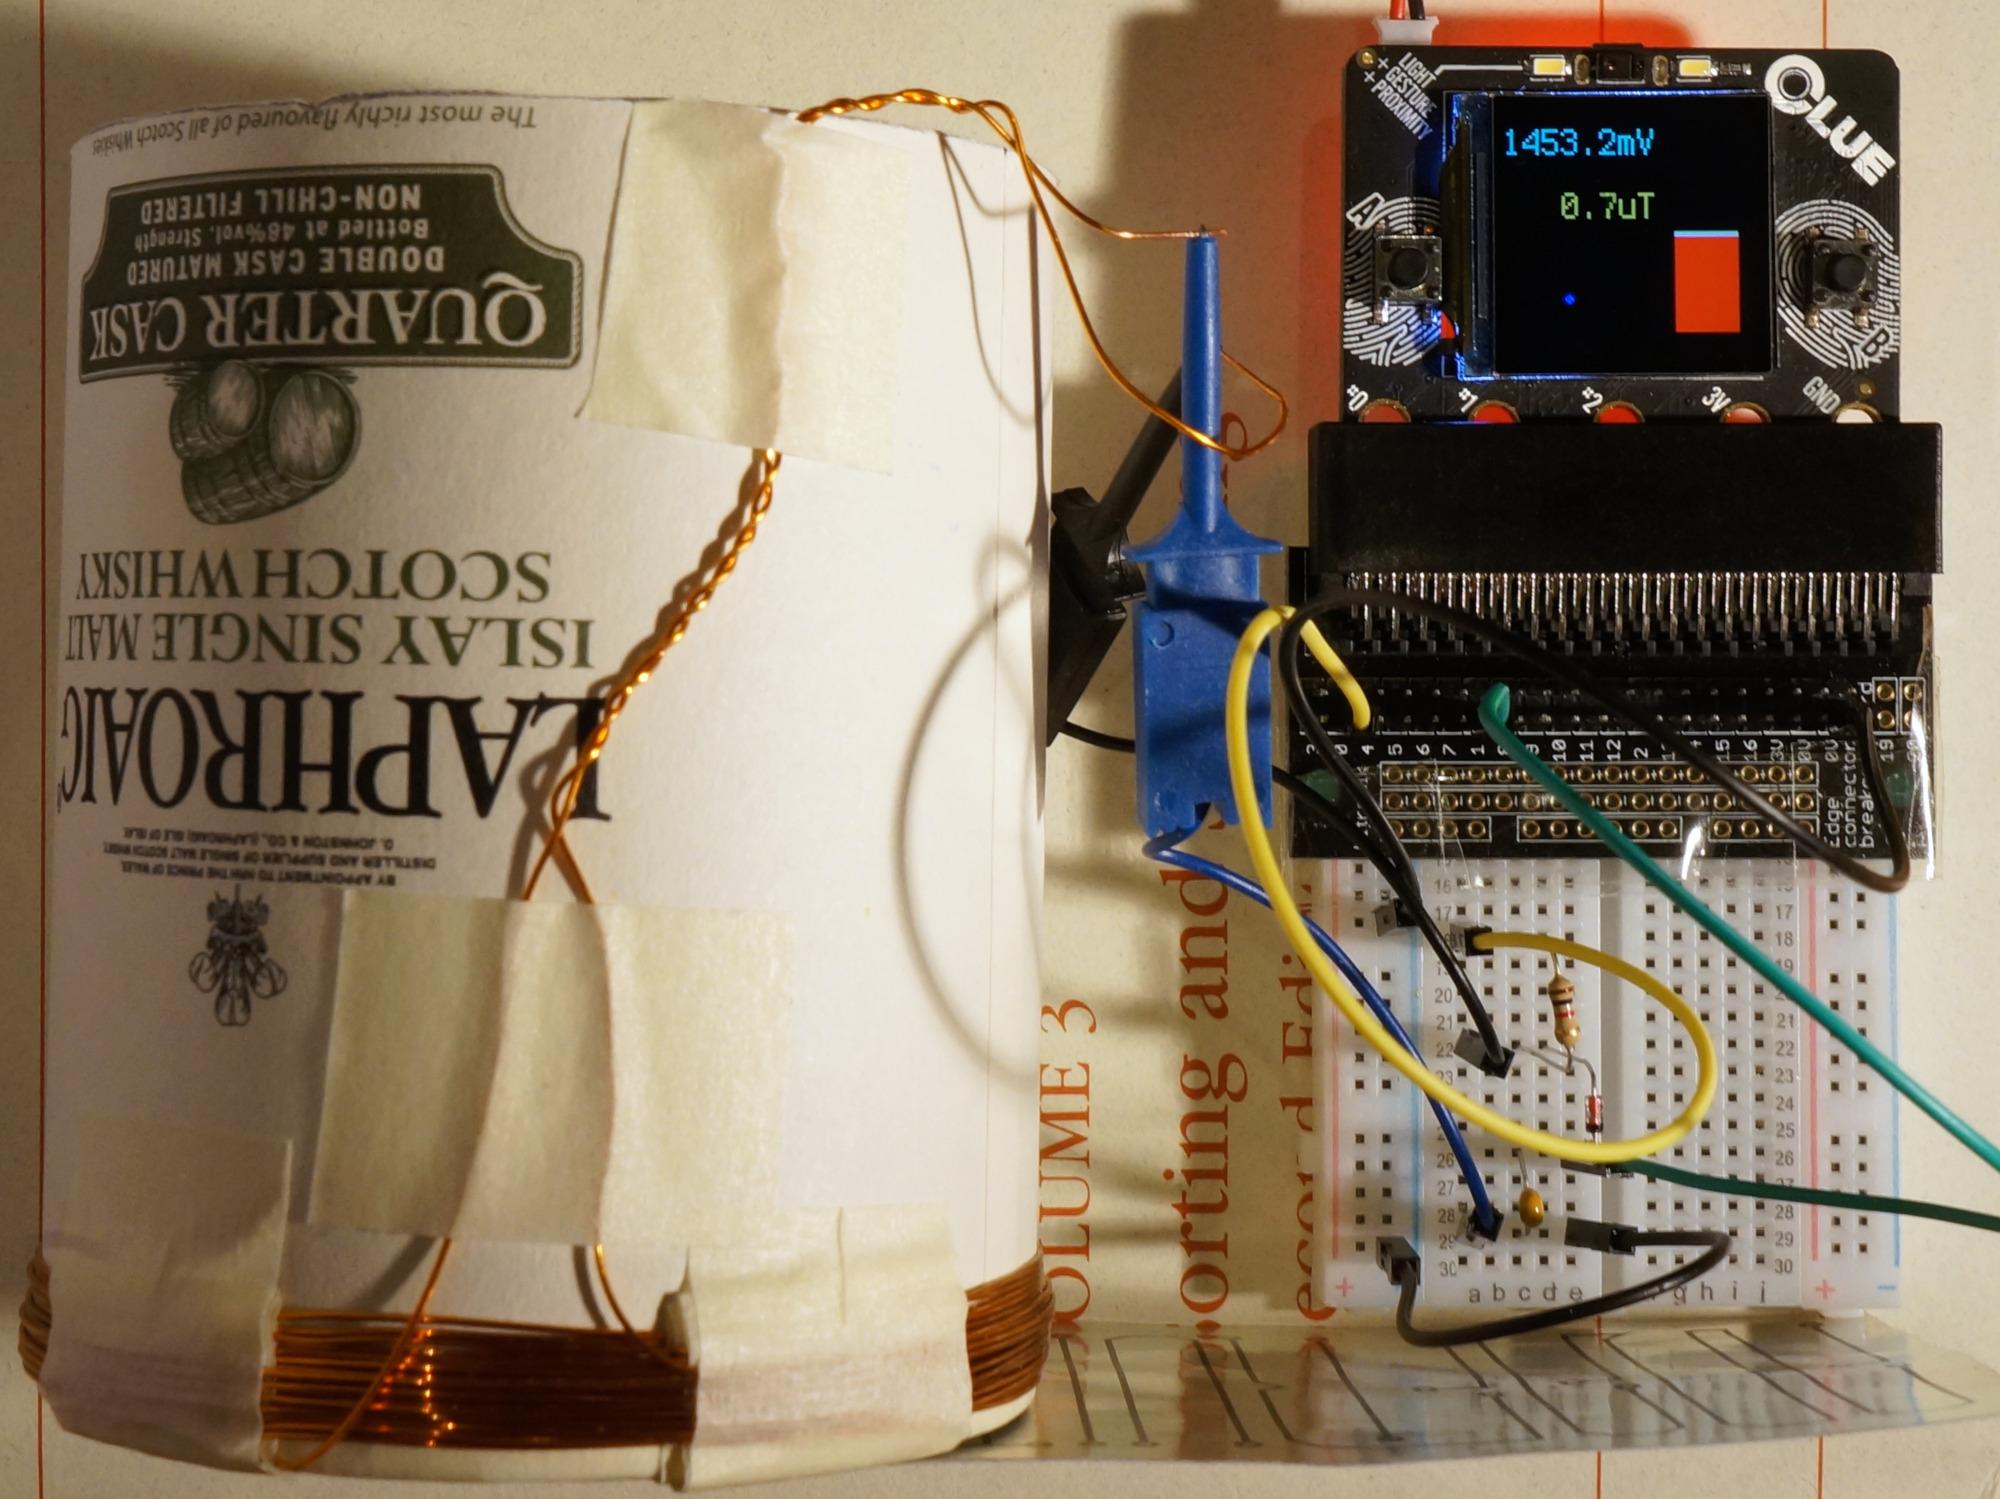 sensors_clue-metal-detector-everything-1-2000x1500.jpg